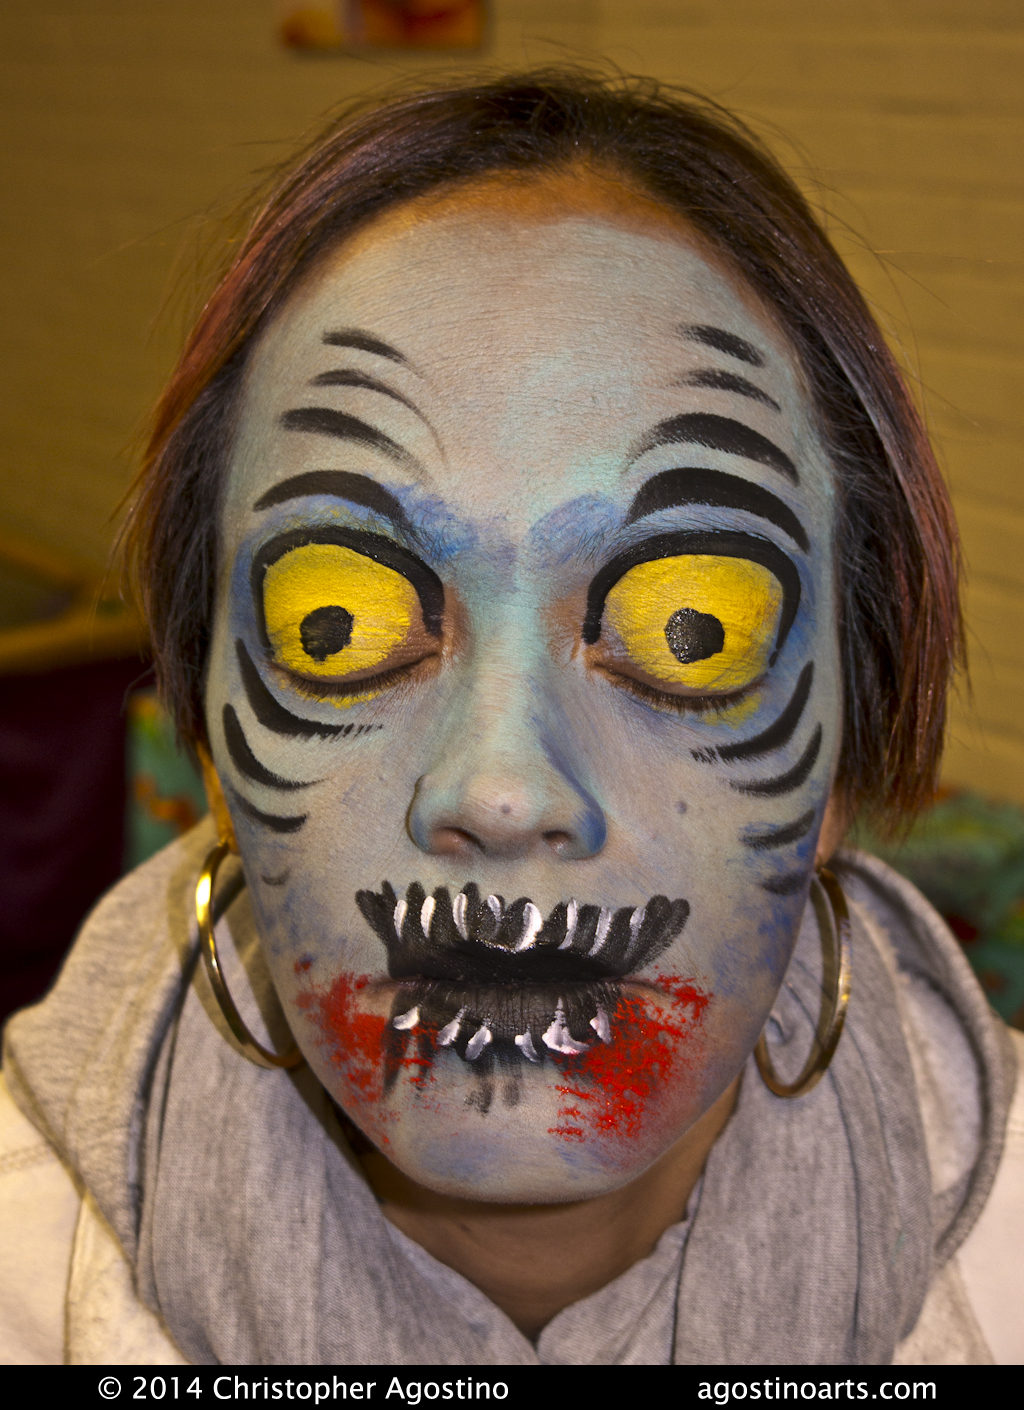 Crazy Eye Make Up: Zombie_crazyEyes_141026_agostinoarts « The Story Behind